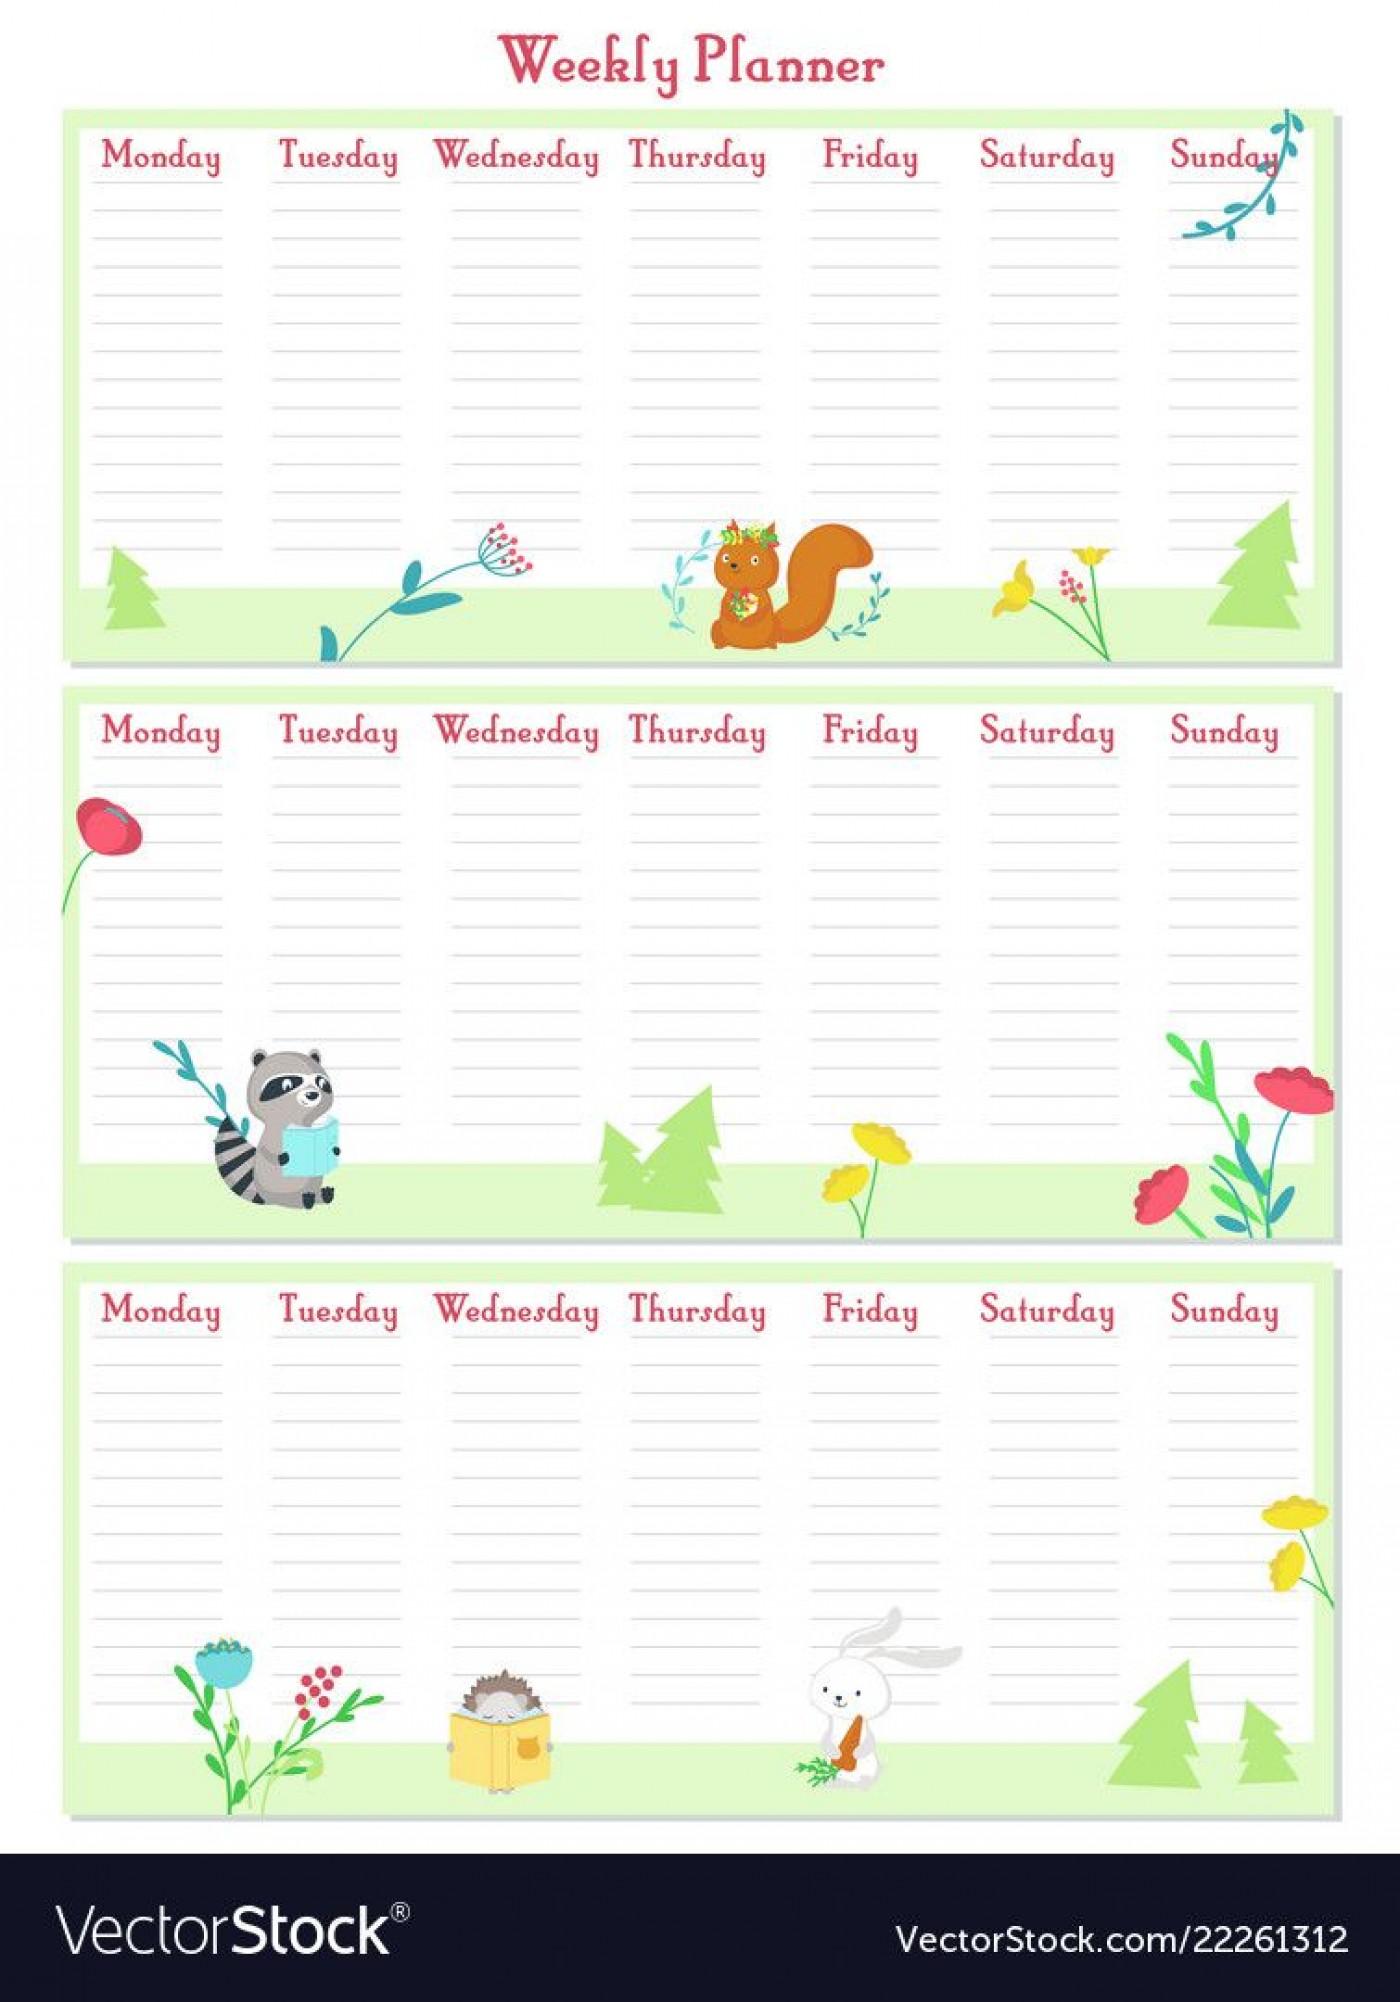 009 Incredible Printable Weekly Planner Template Cute Highest Clarity  Free Calendar1400